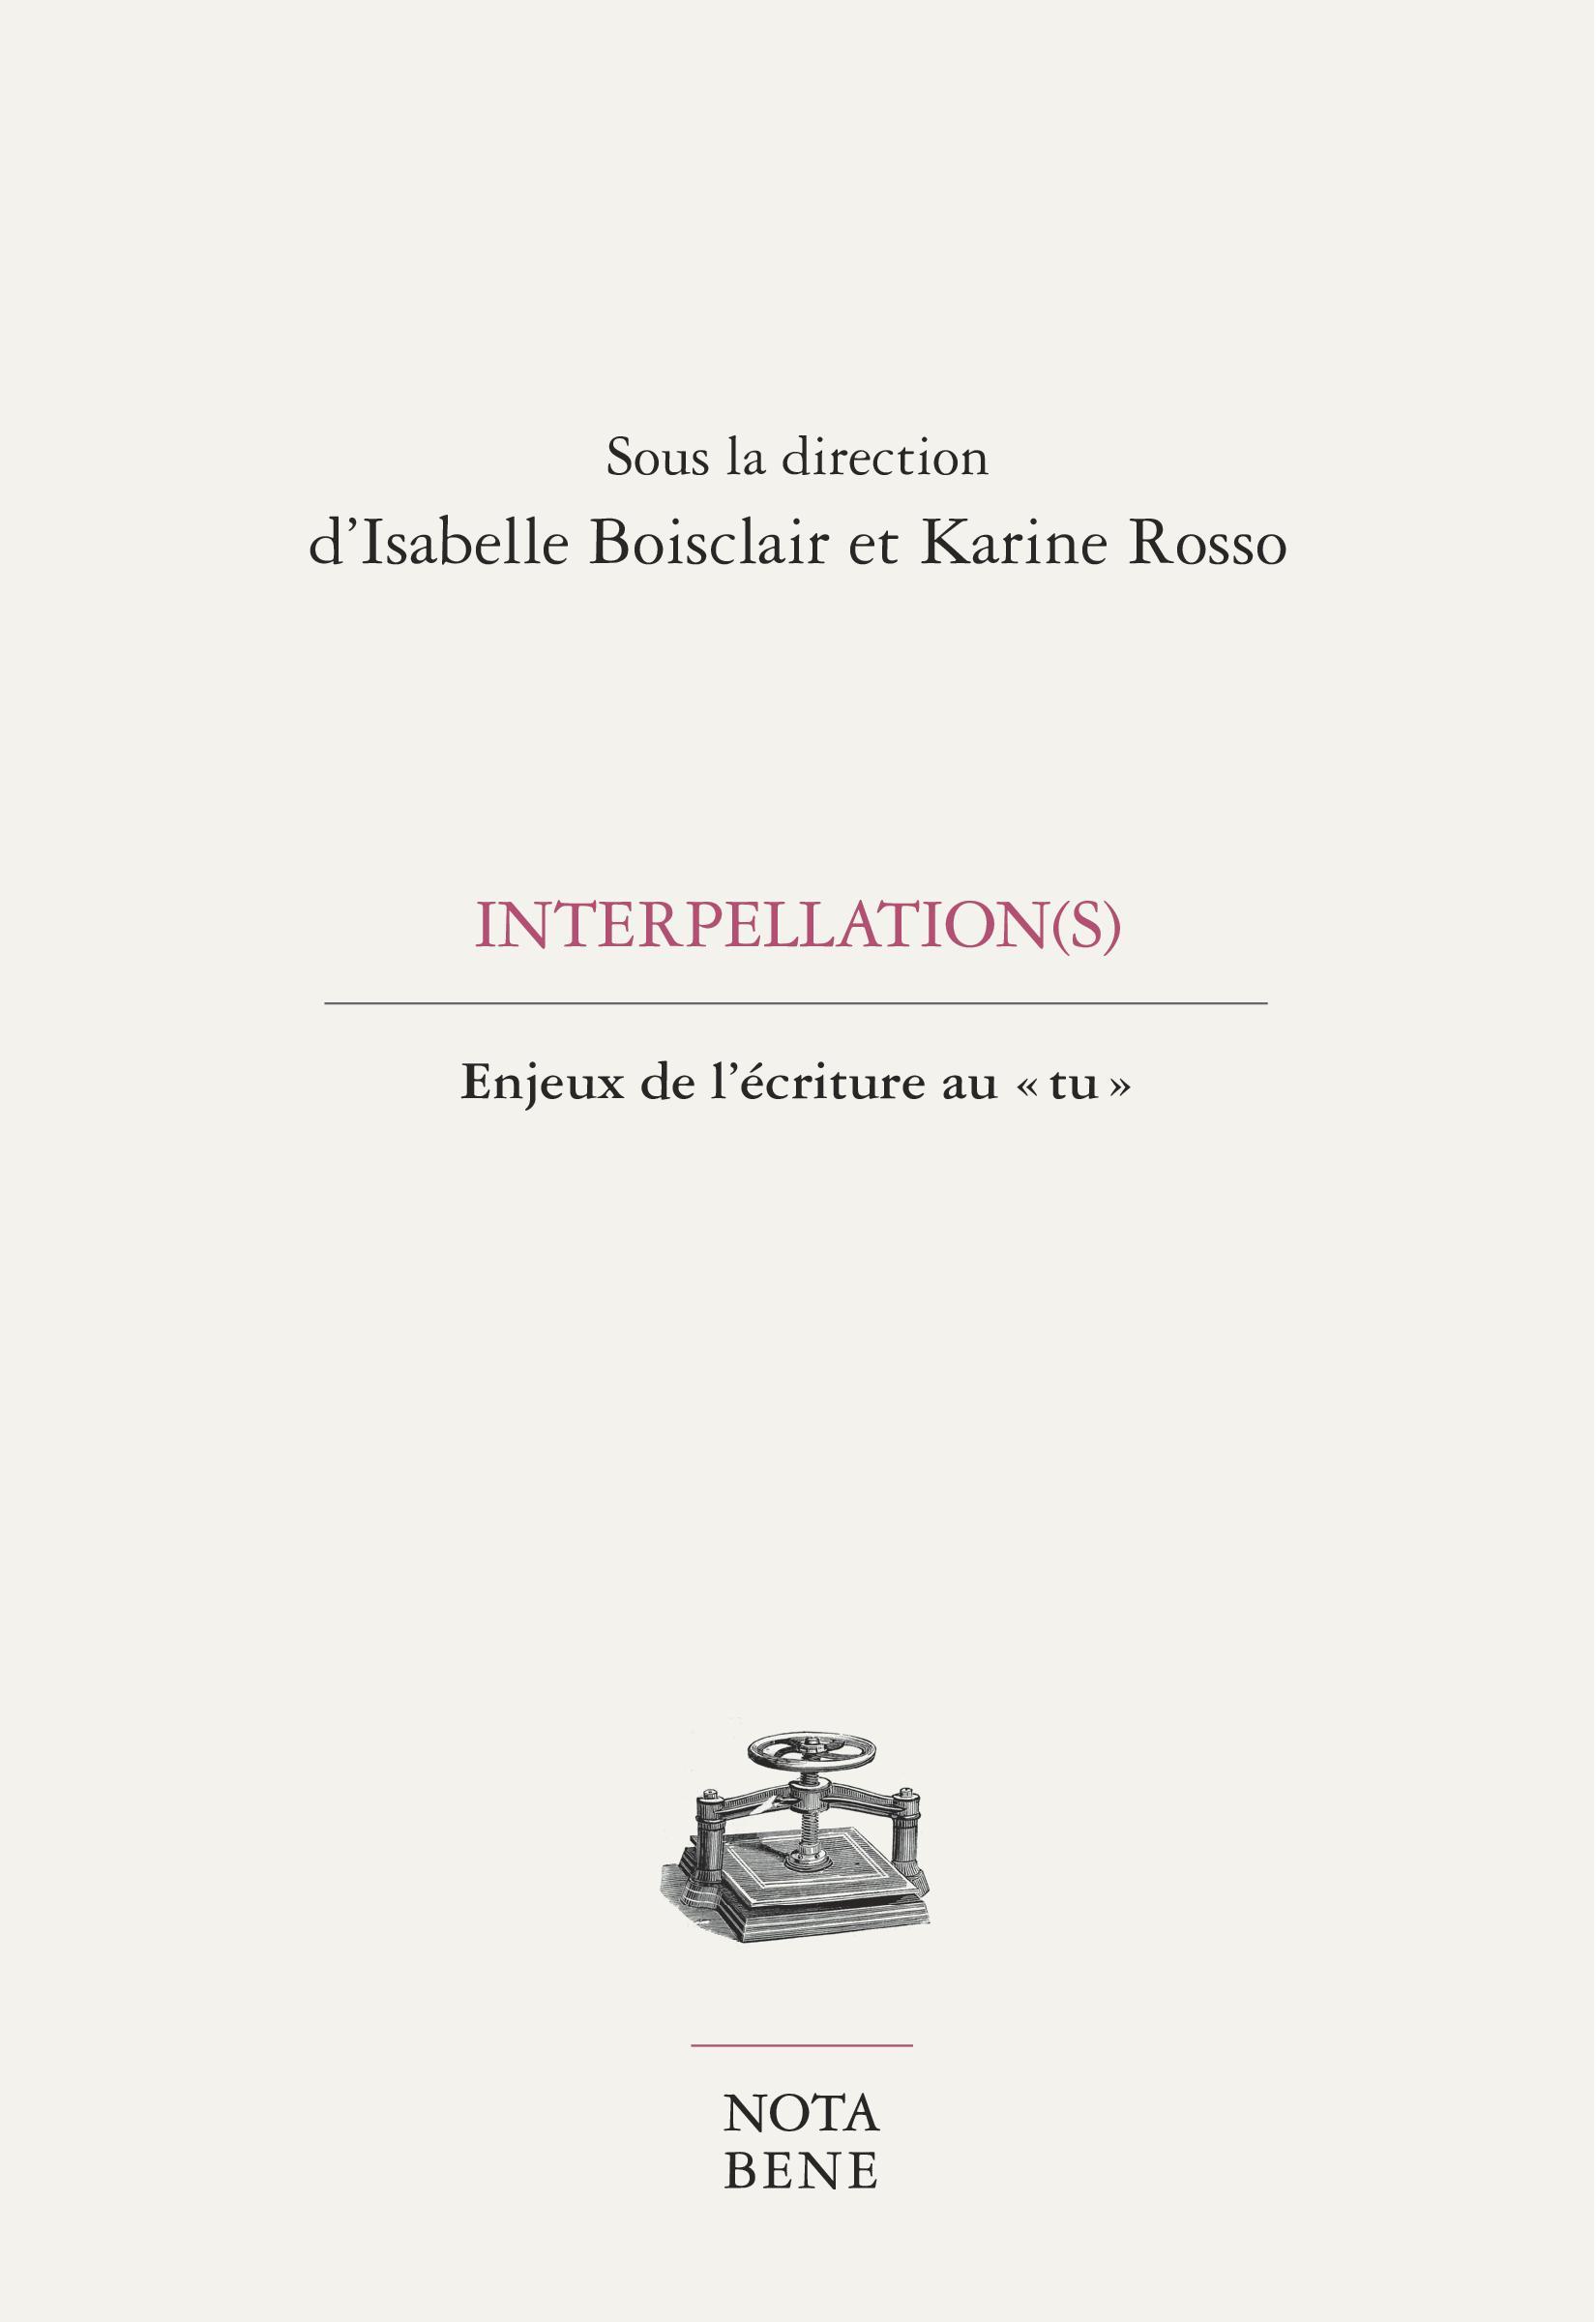 Interpellation(s)